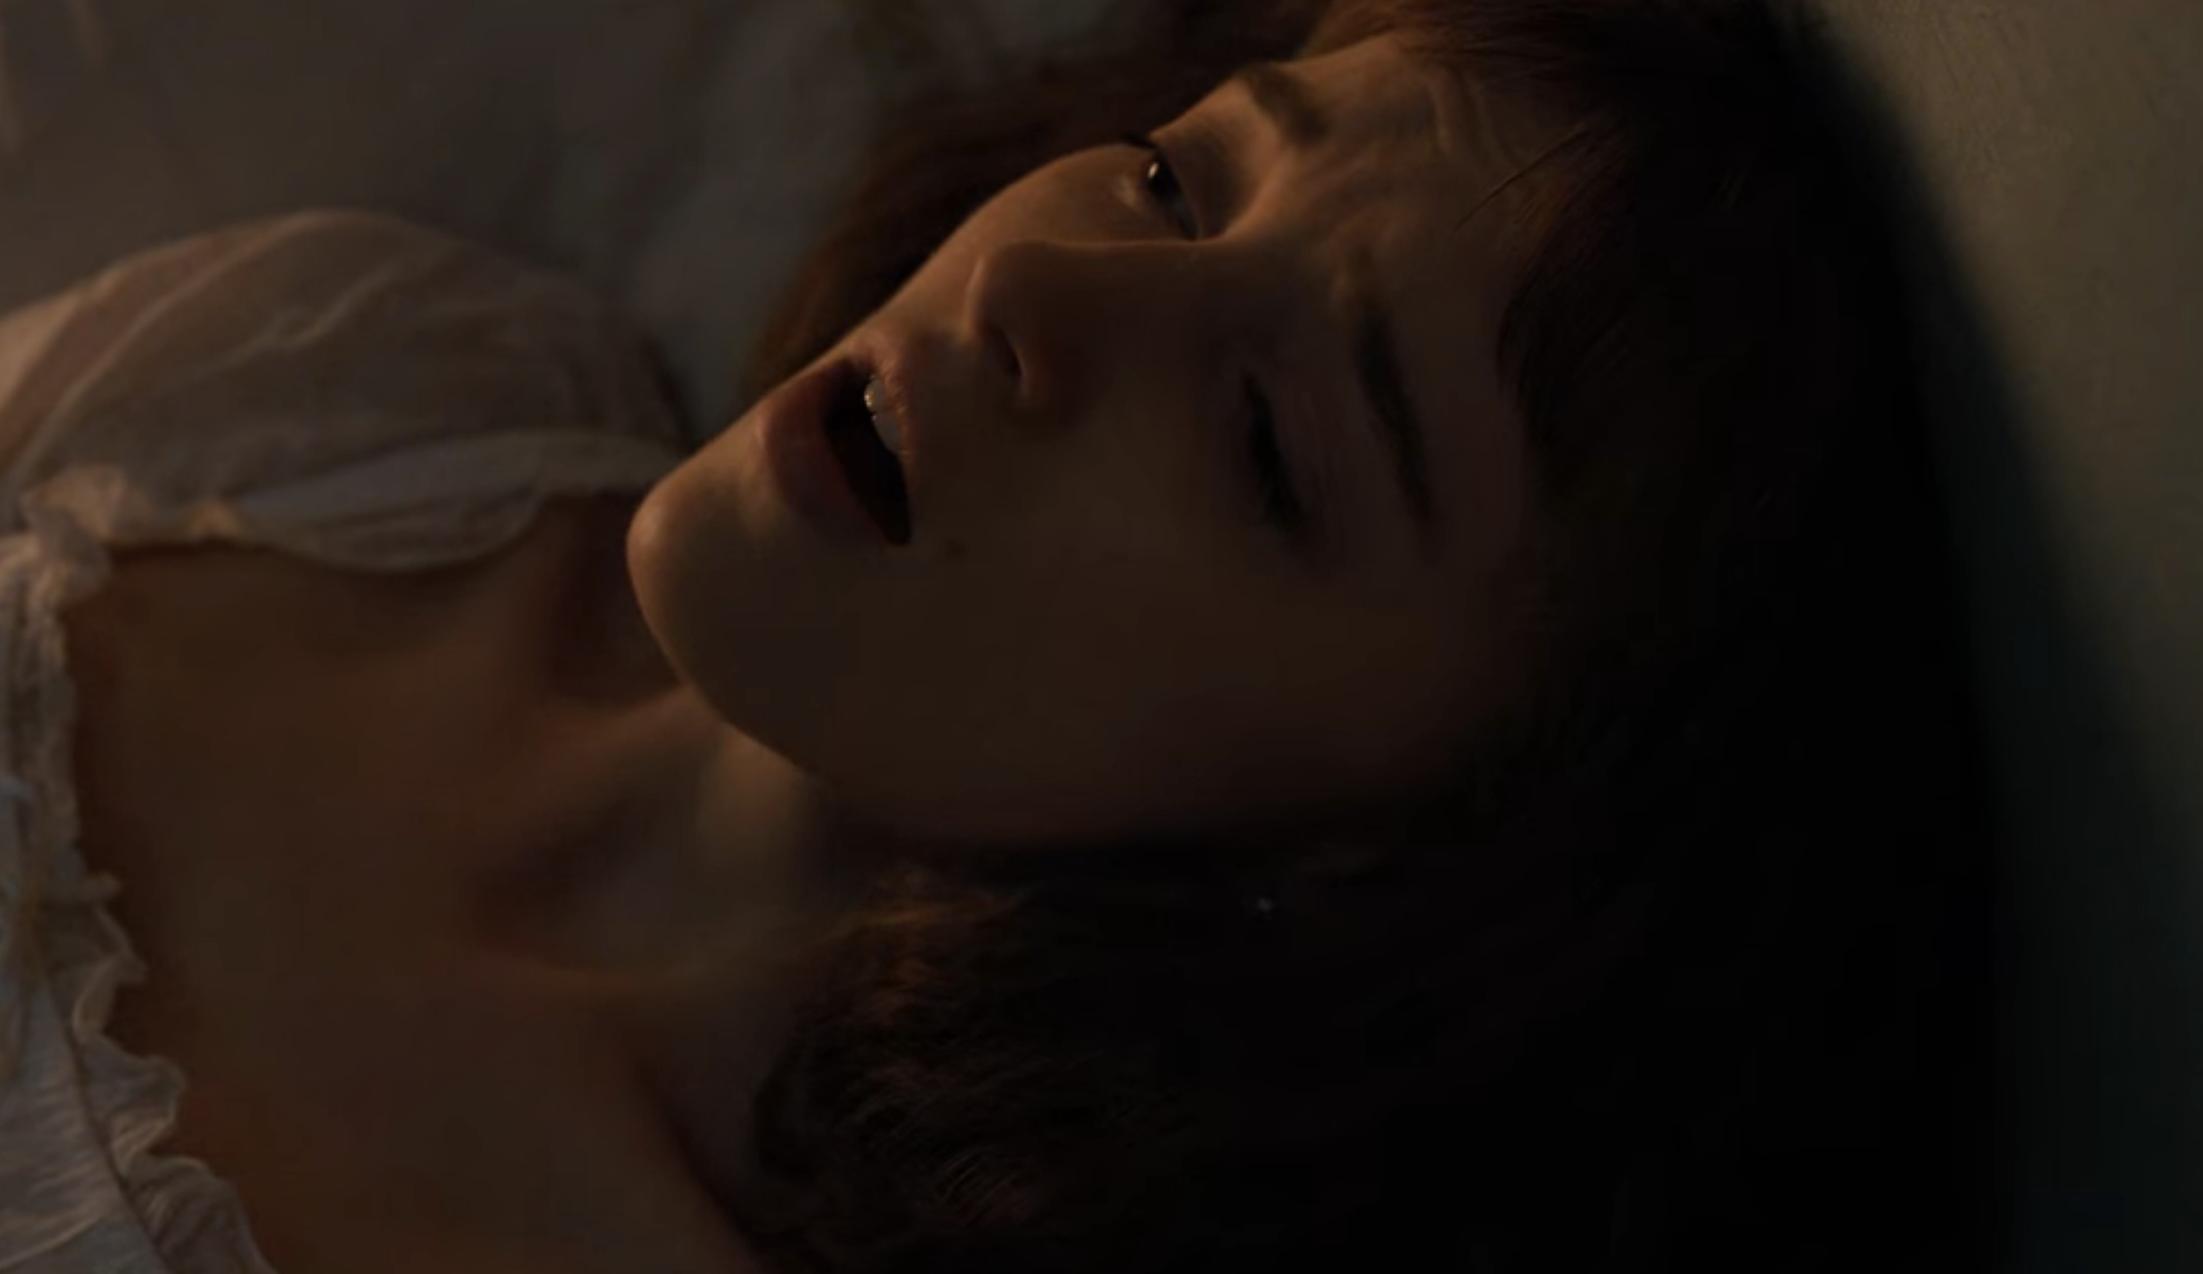 Daphne in bed during the masturbation scene